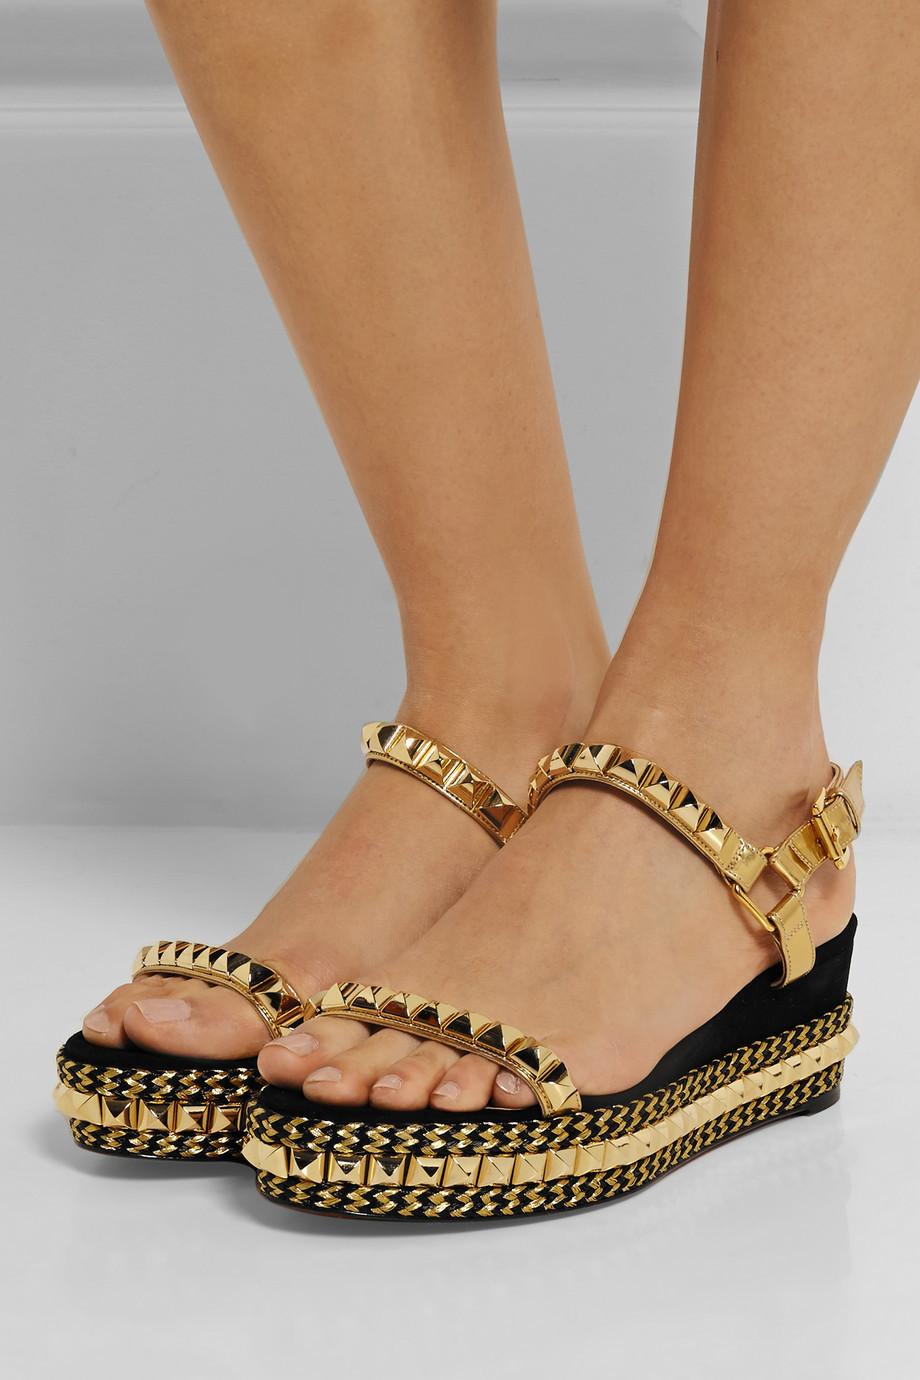 2015 Luxurious Women Sandals Genuine Leather Slippers Shoes Brand Designer High Quality Women Rivet Platfrom Flip Flops Sandal<br><br>Aliexpress